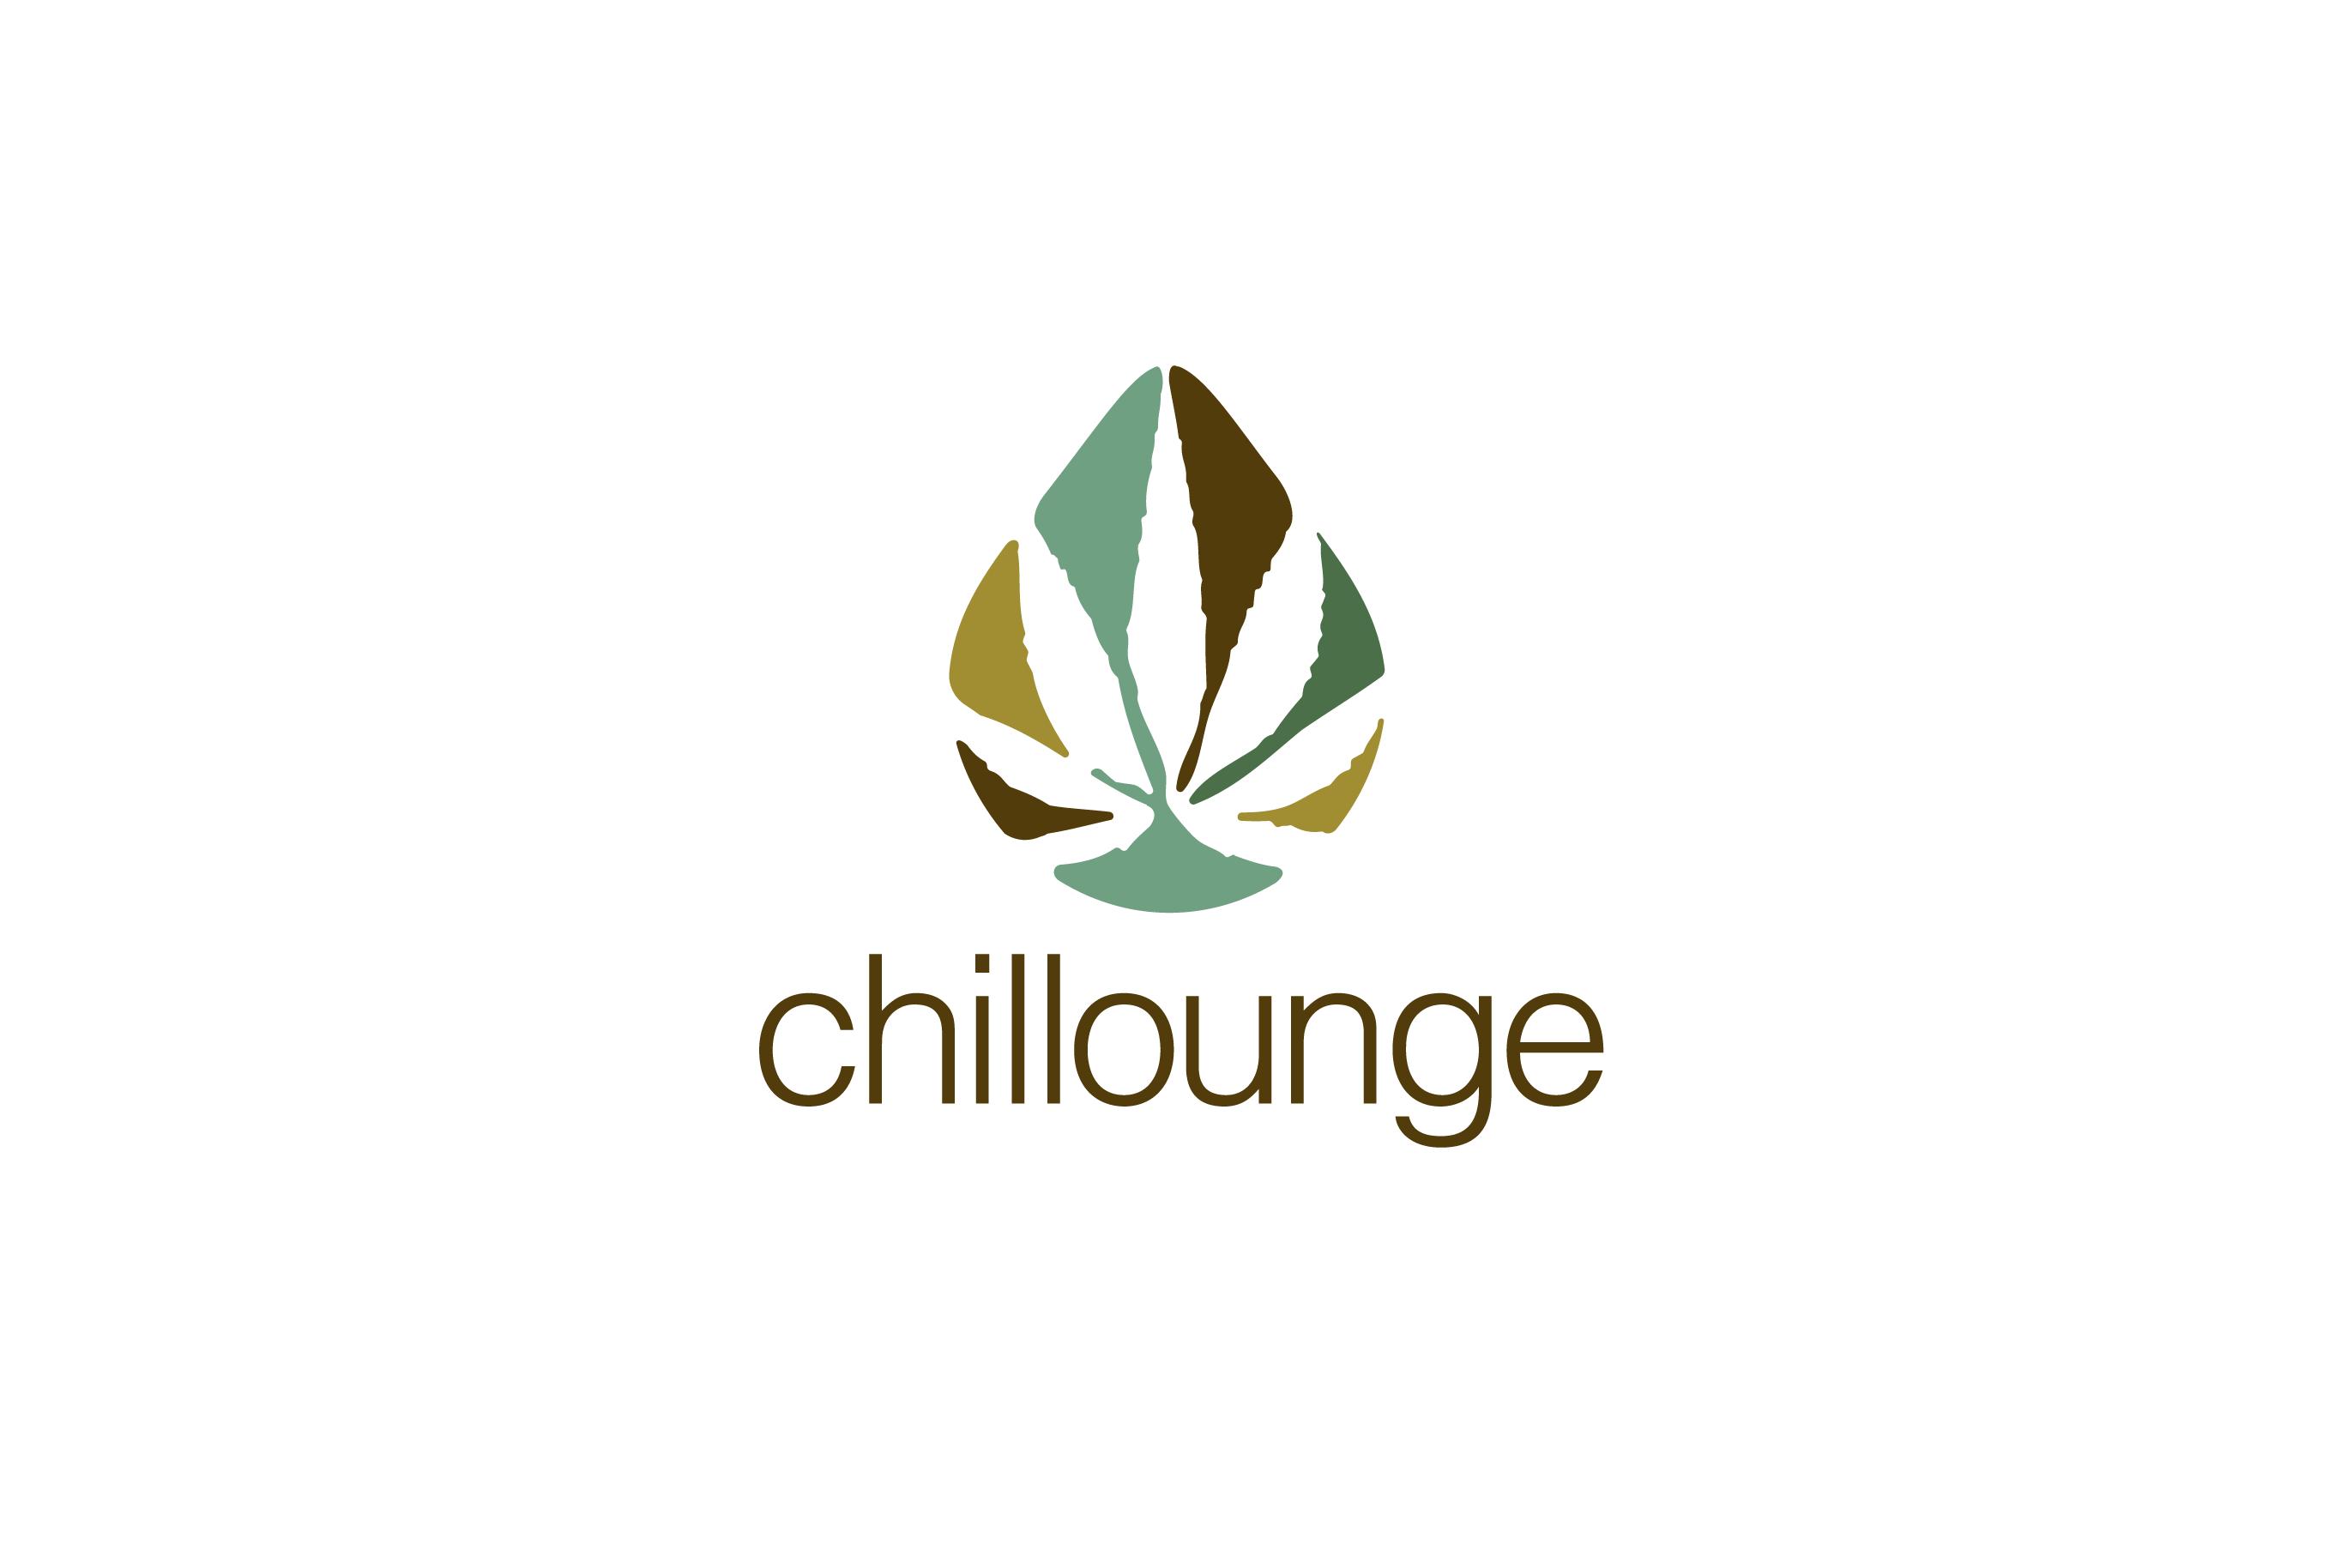 SOLD - ChillLounge Leaf Marijuana Logo Design - Logo Cowboy